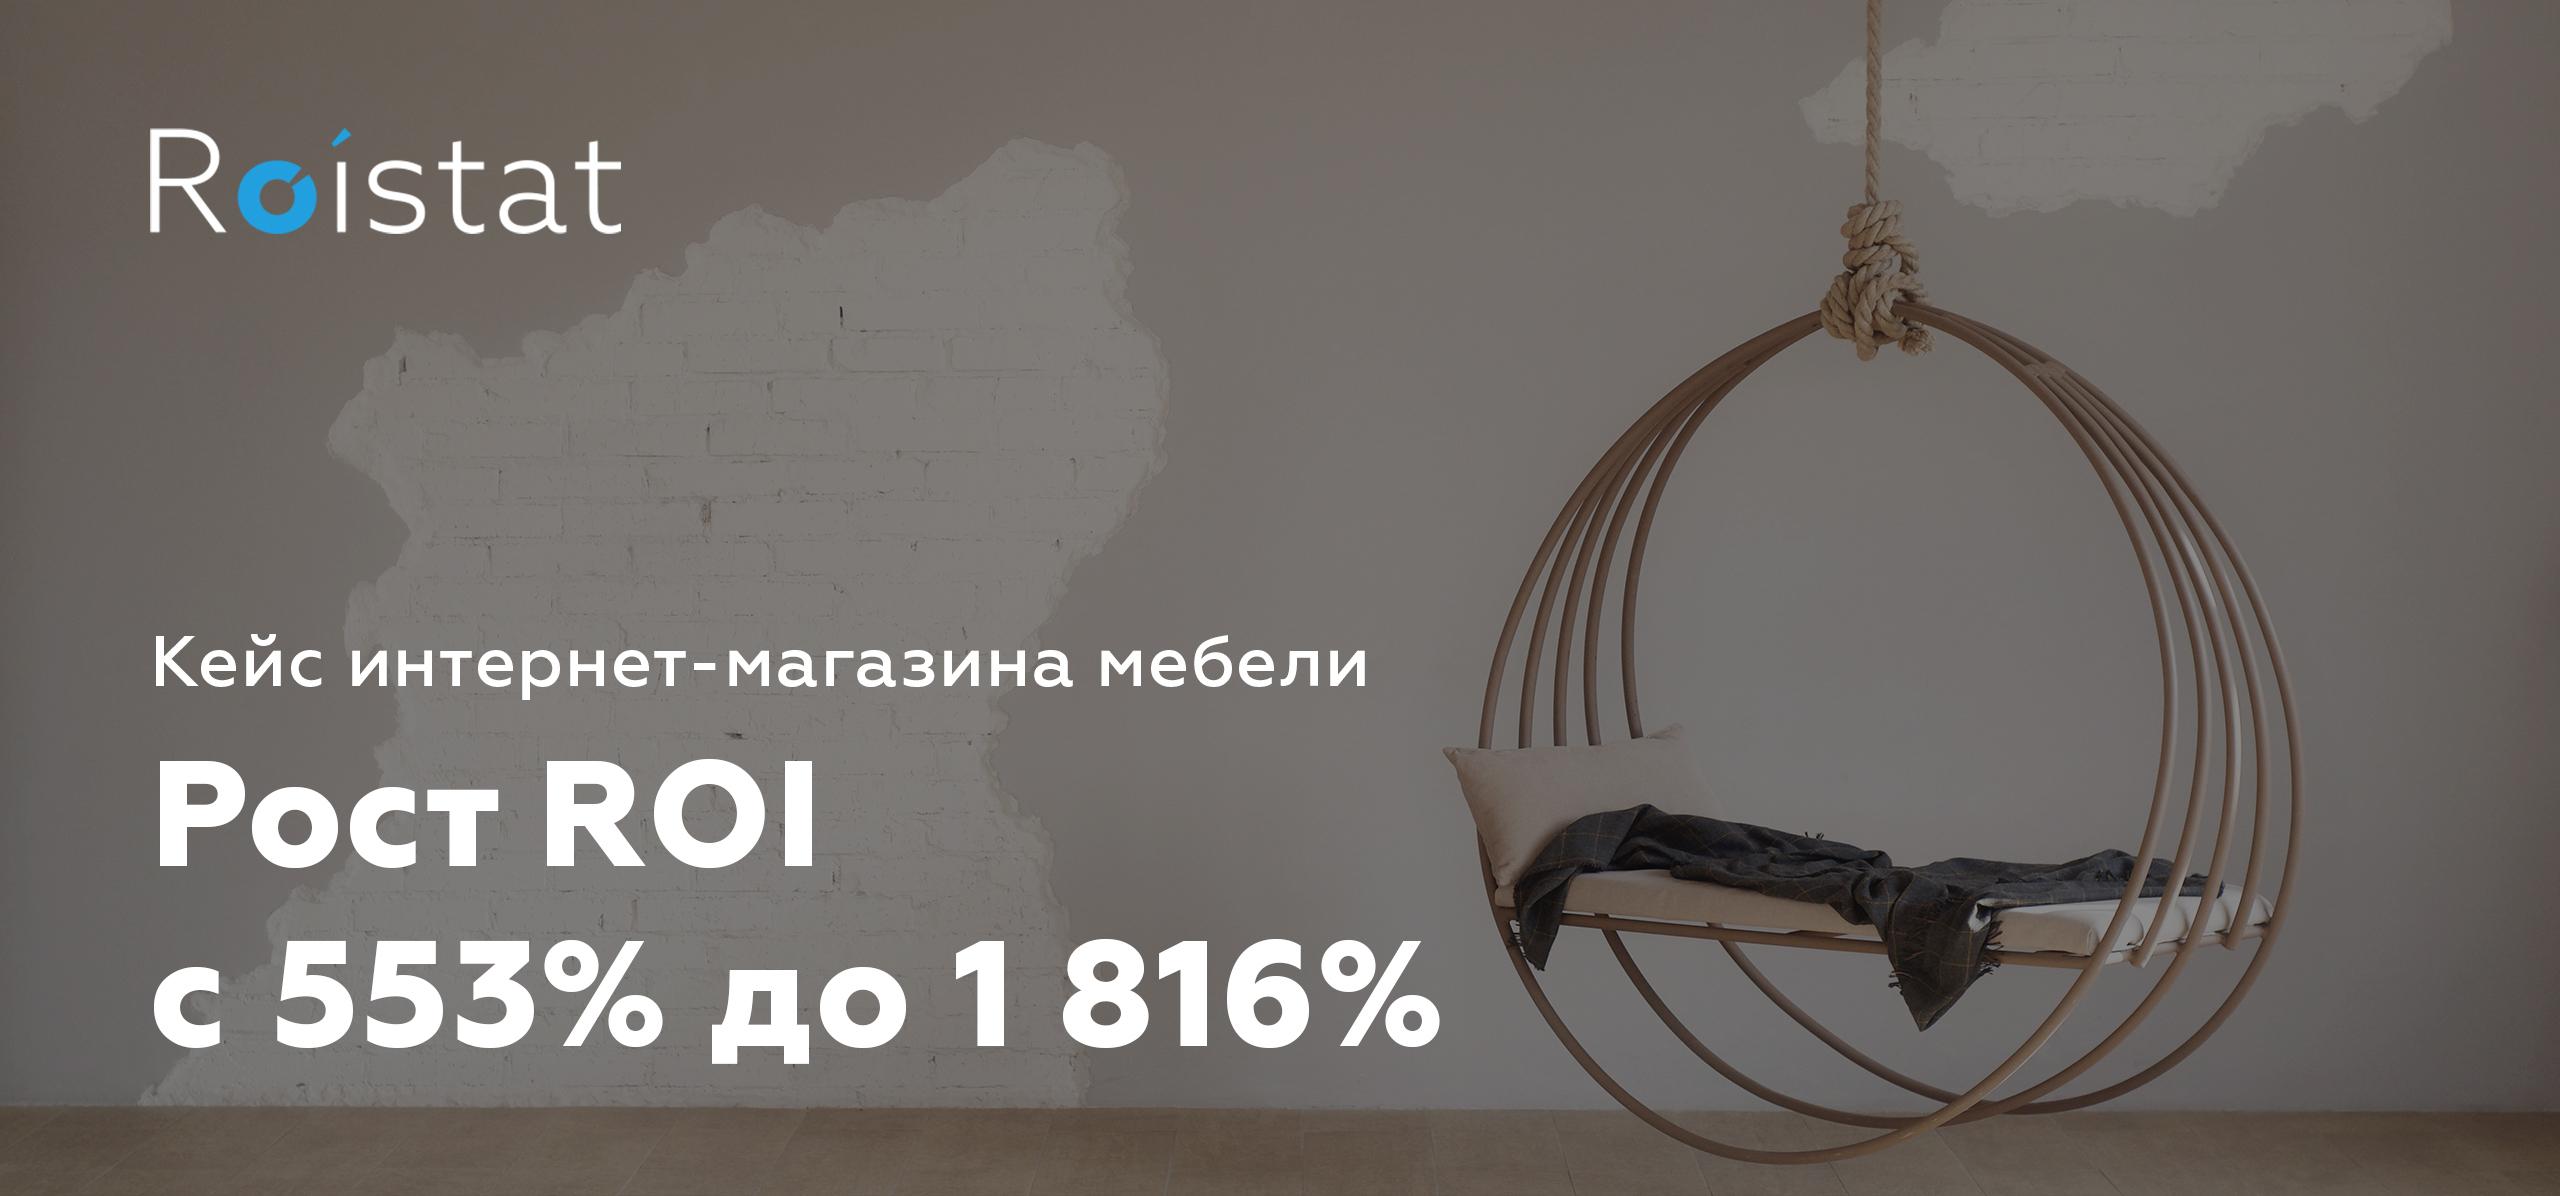 Рост ROI до 1816% для интернет-магазина мебели